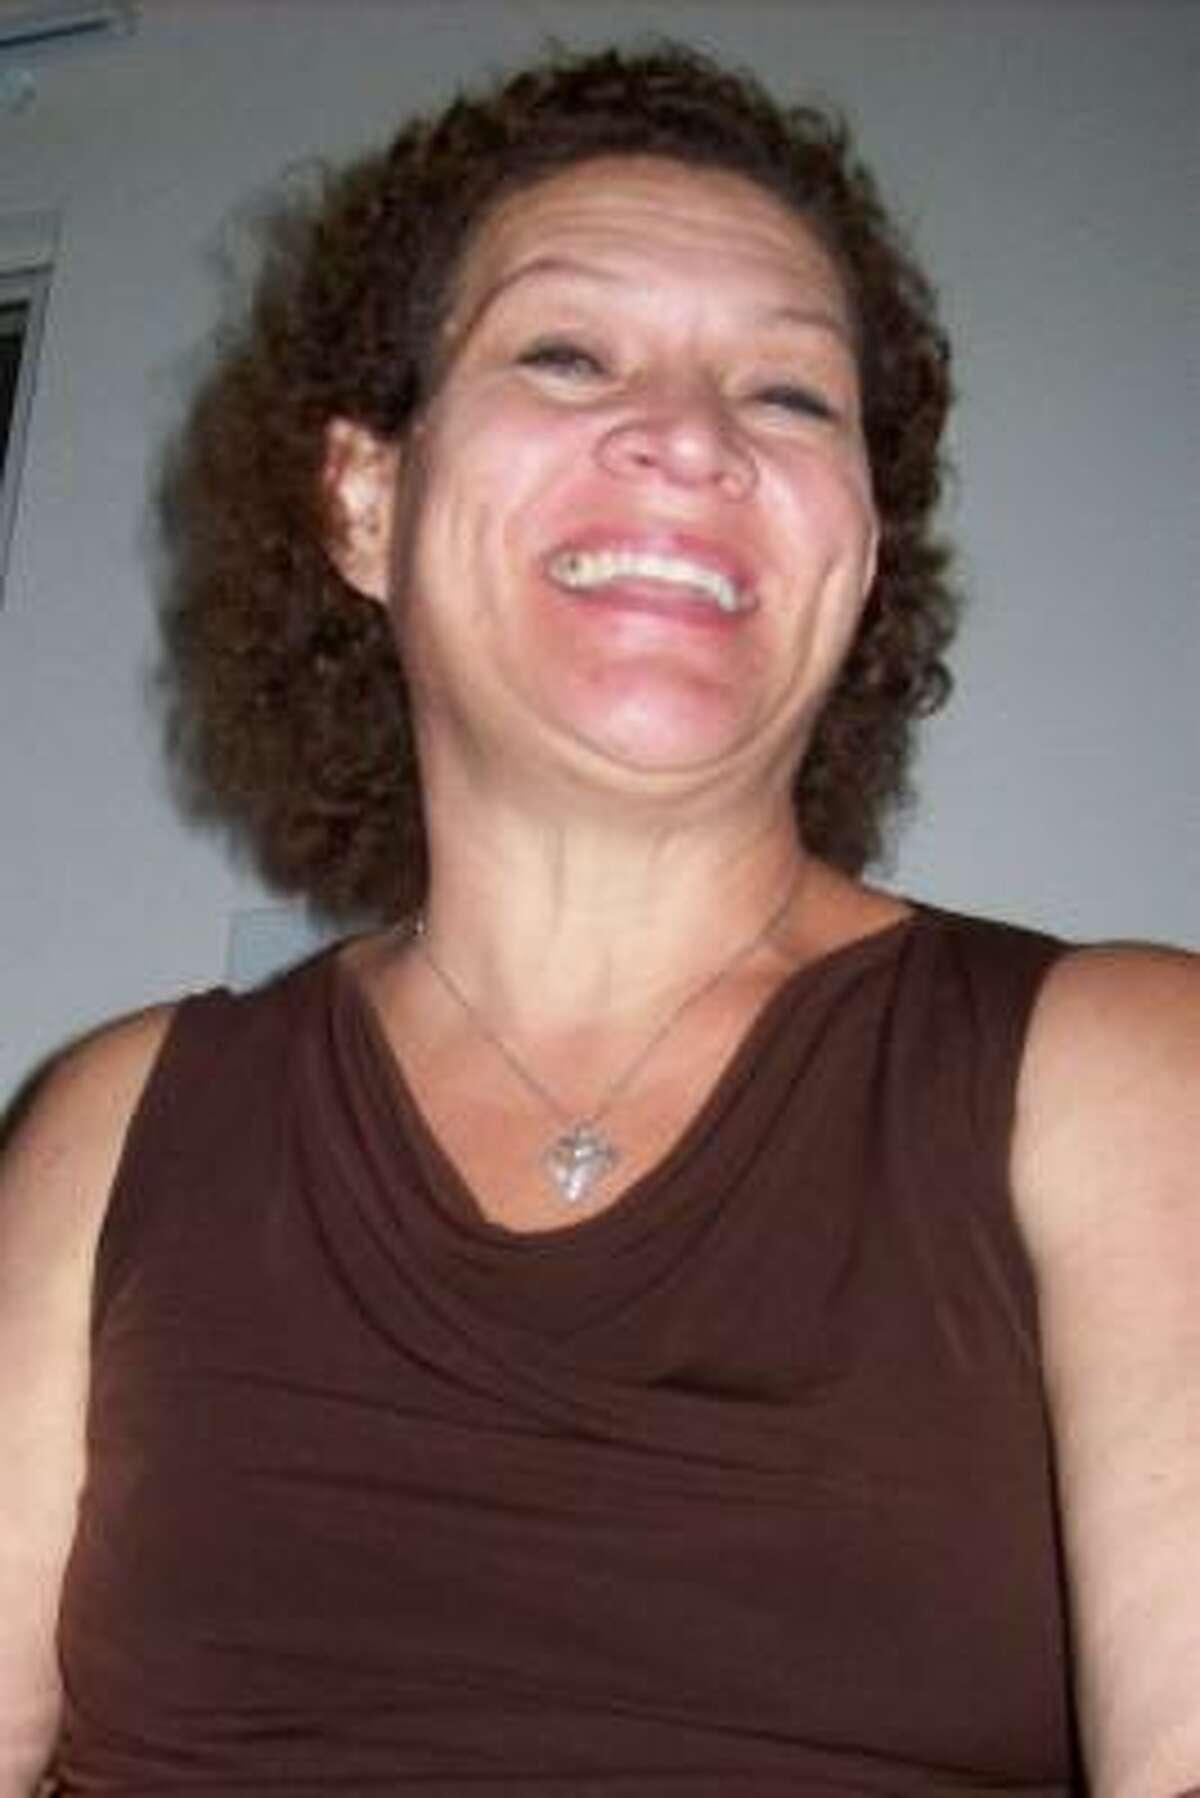 Margaret Lorrain Womble Smith had been free on $125,000 bail.